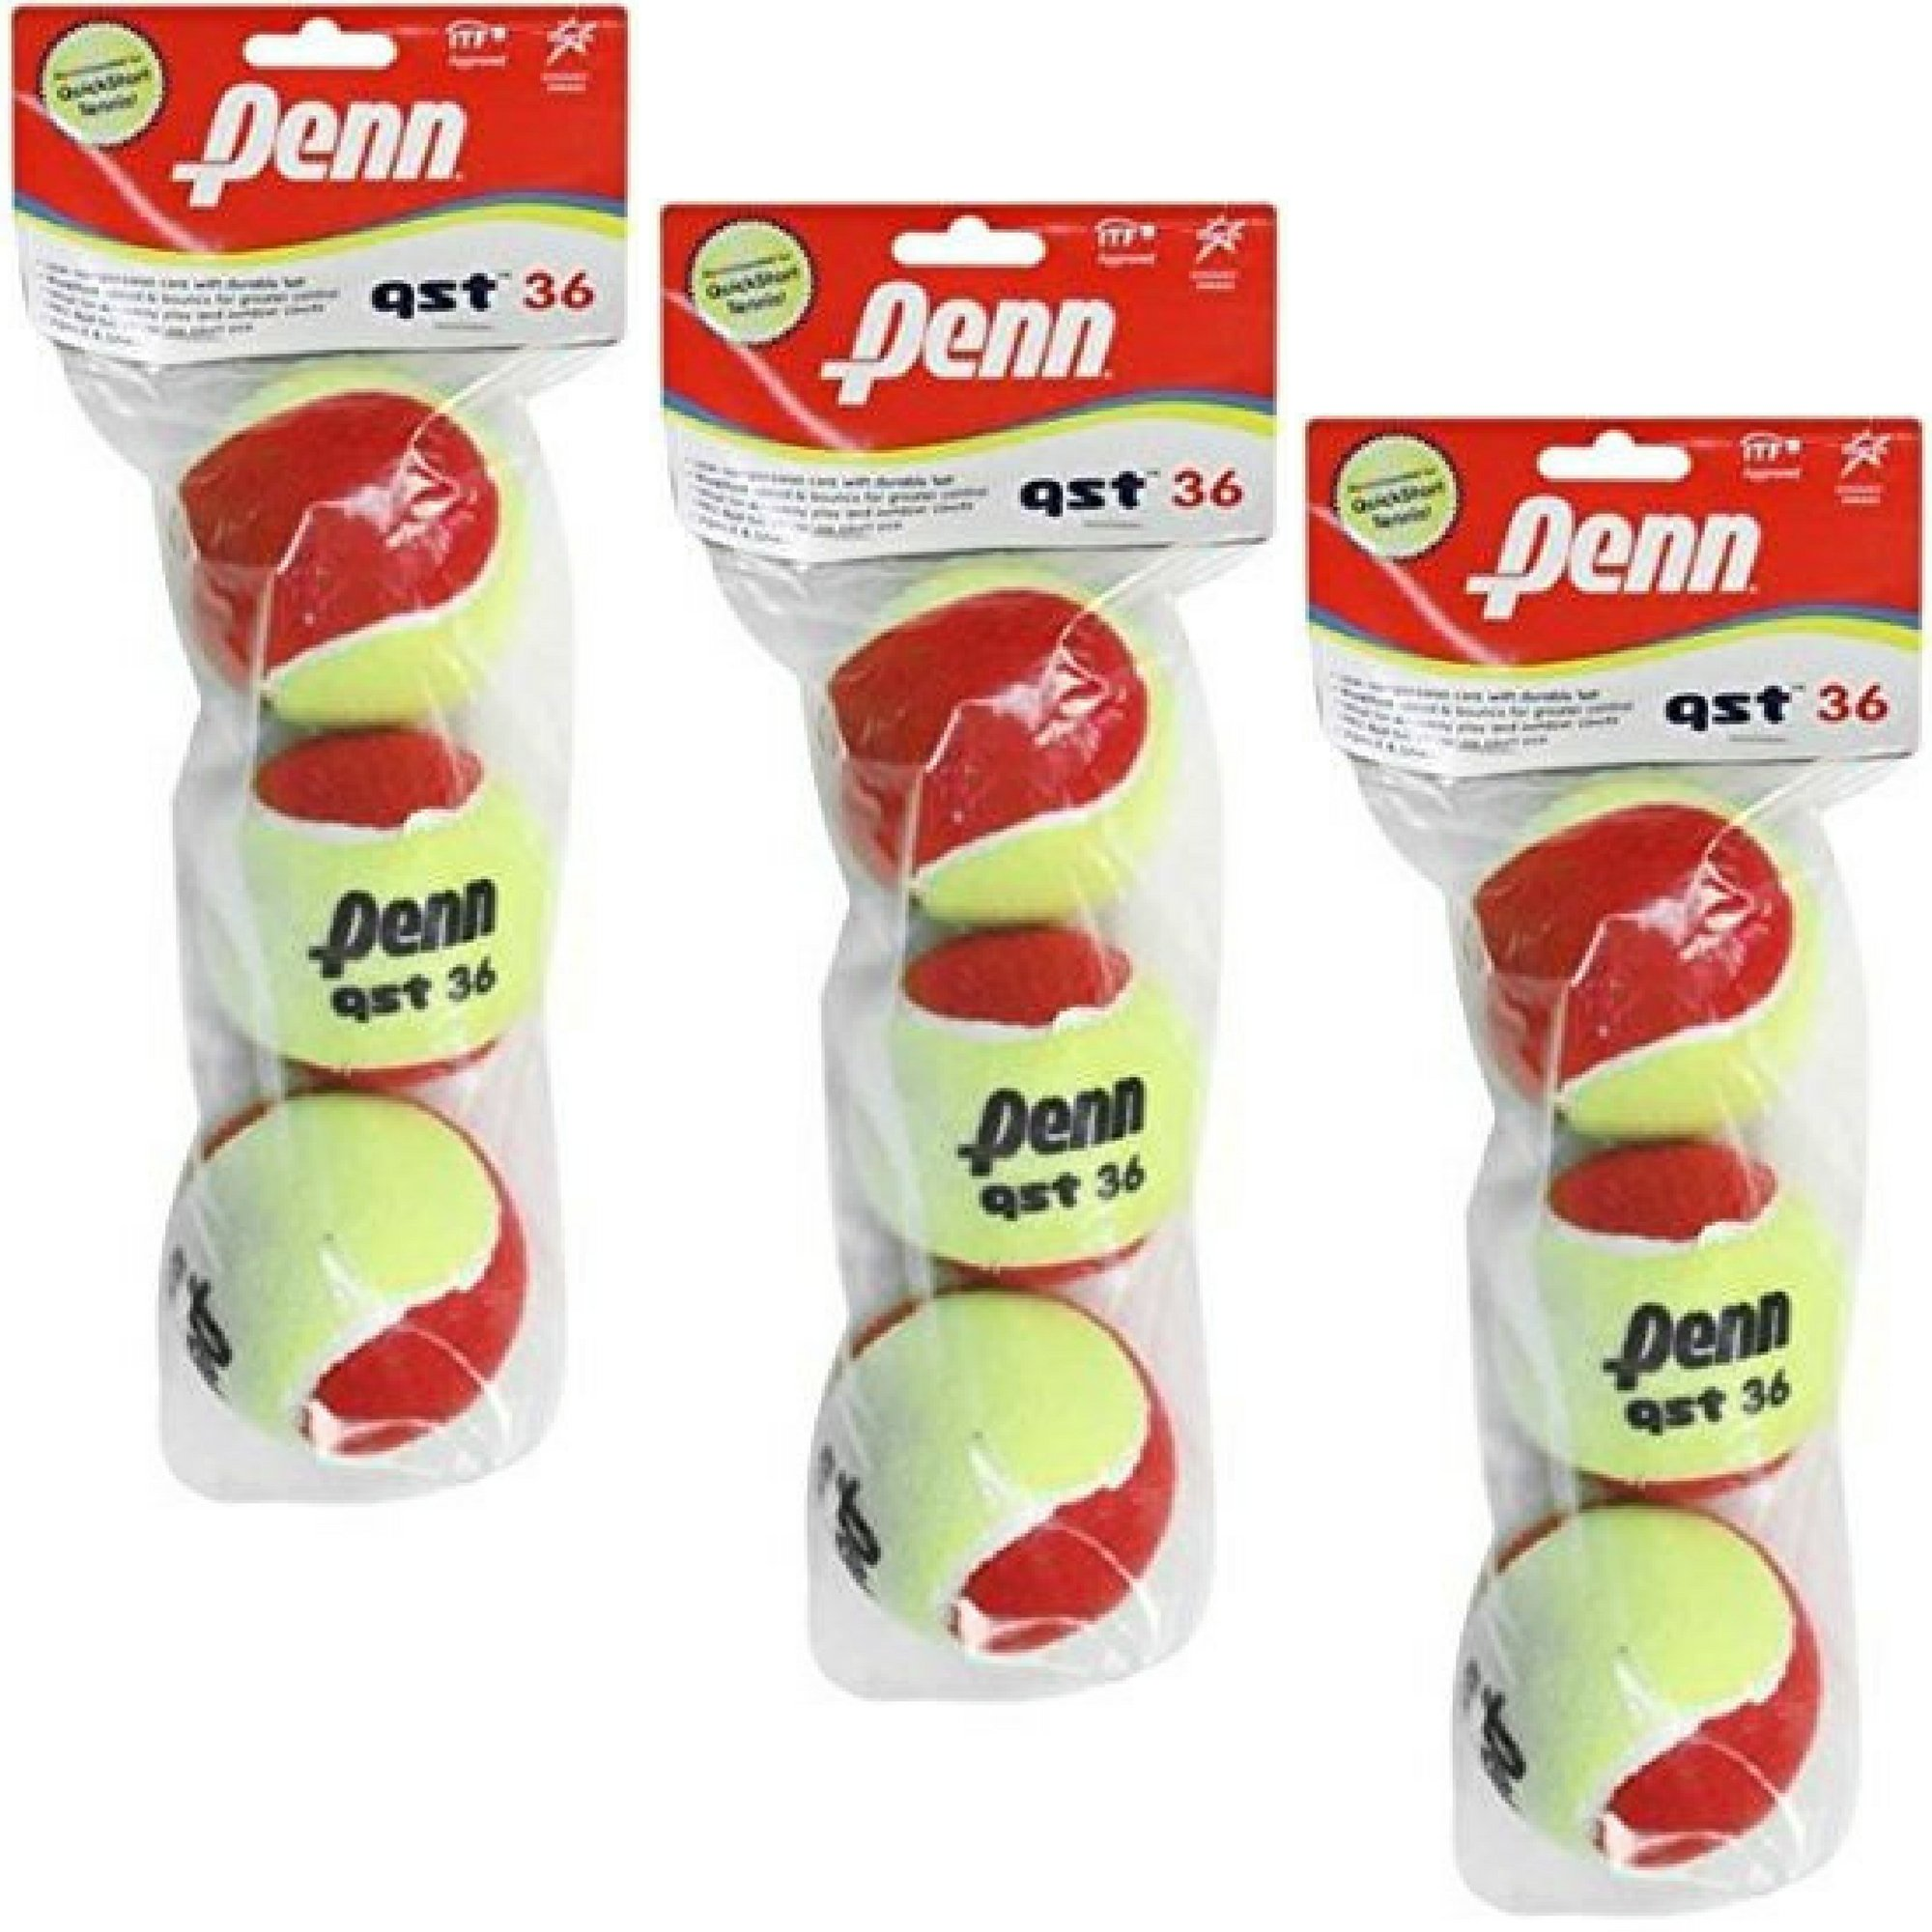 Penn QST 36 Boys/Girls Youth Beginner Tennis Balls (3-Pack: 9 Balls Total)